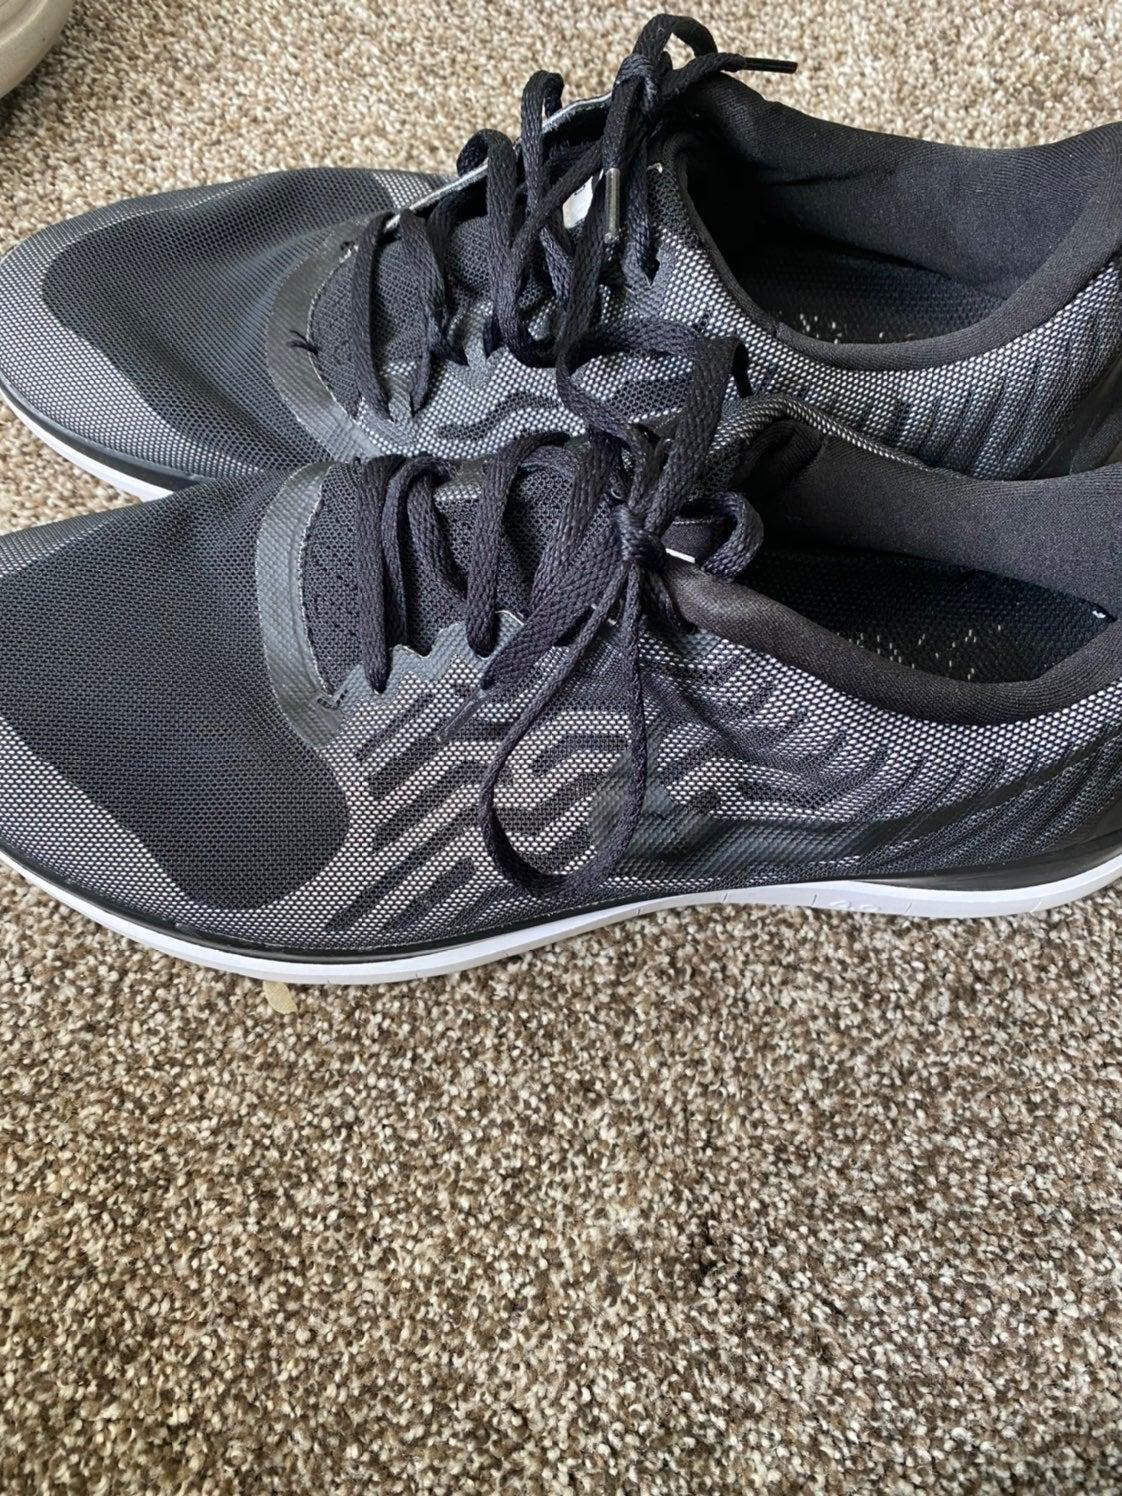 Nike men shoes